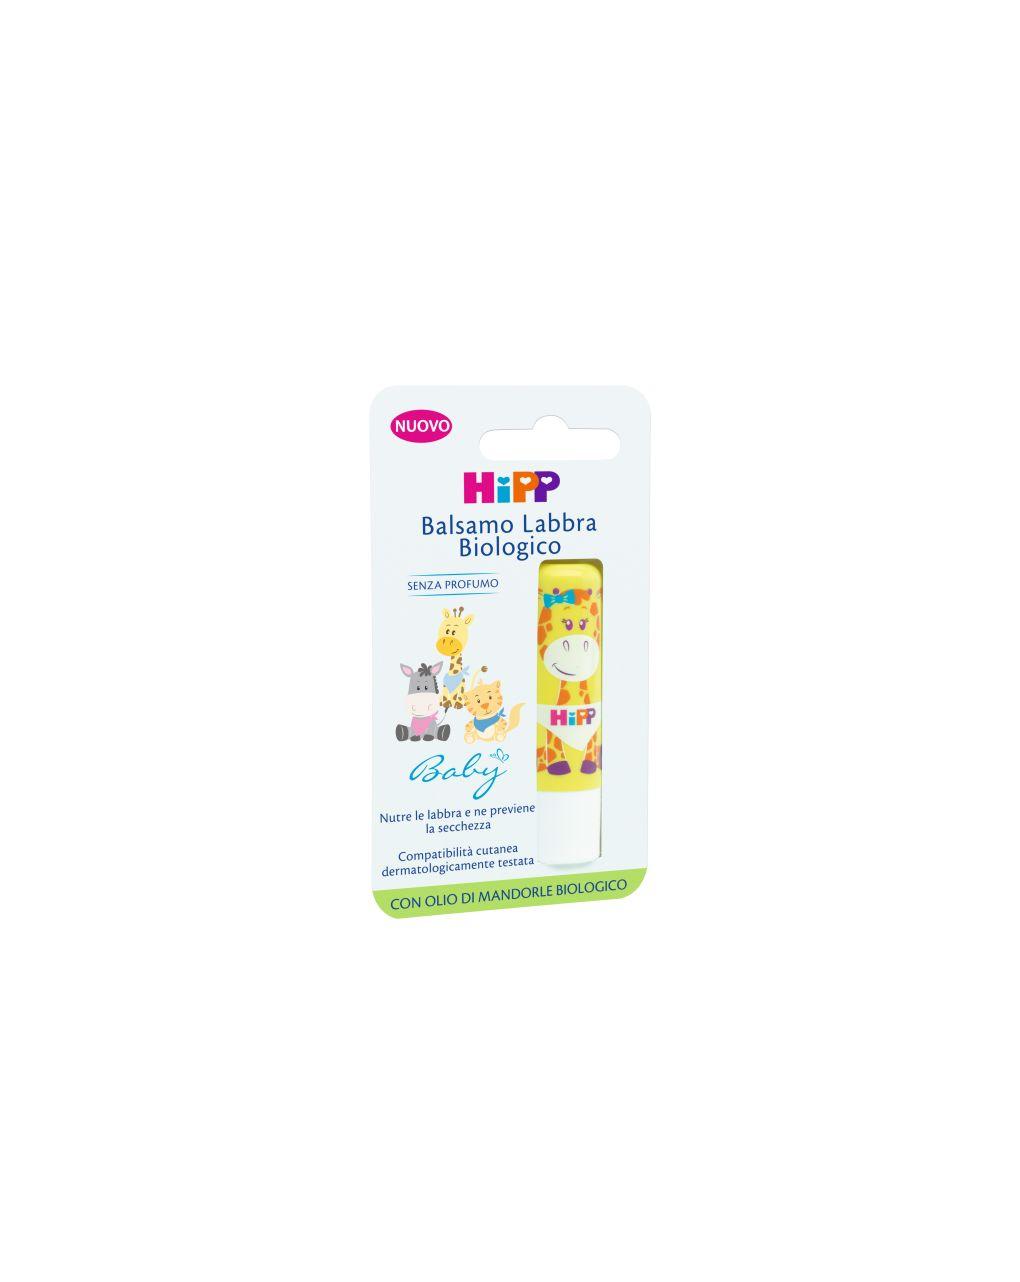 Balsamo labbra biologico 4,8 gr - Hipp